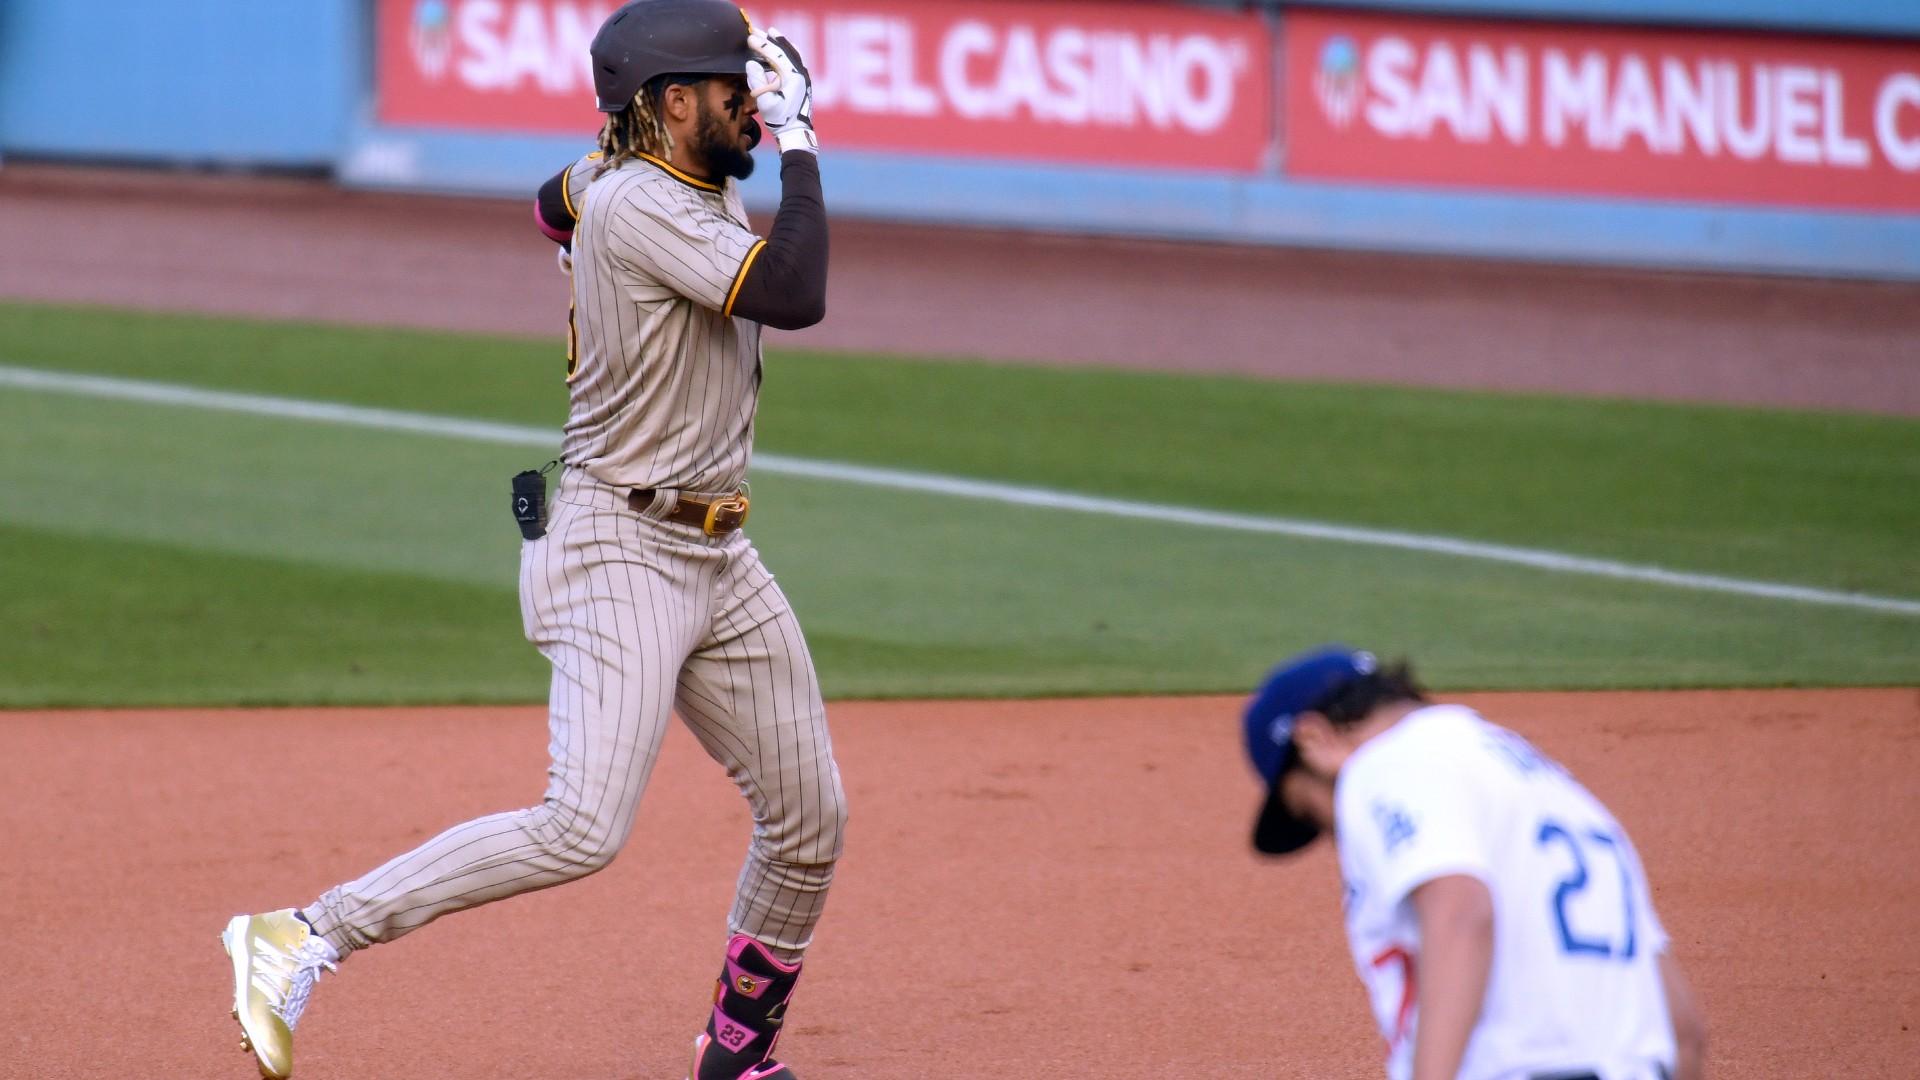 Padres' Fernando Tatis Jr. trolls Dodgers' Trevor Bauer twice after home runs; Bauer's fine with it